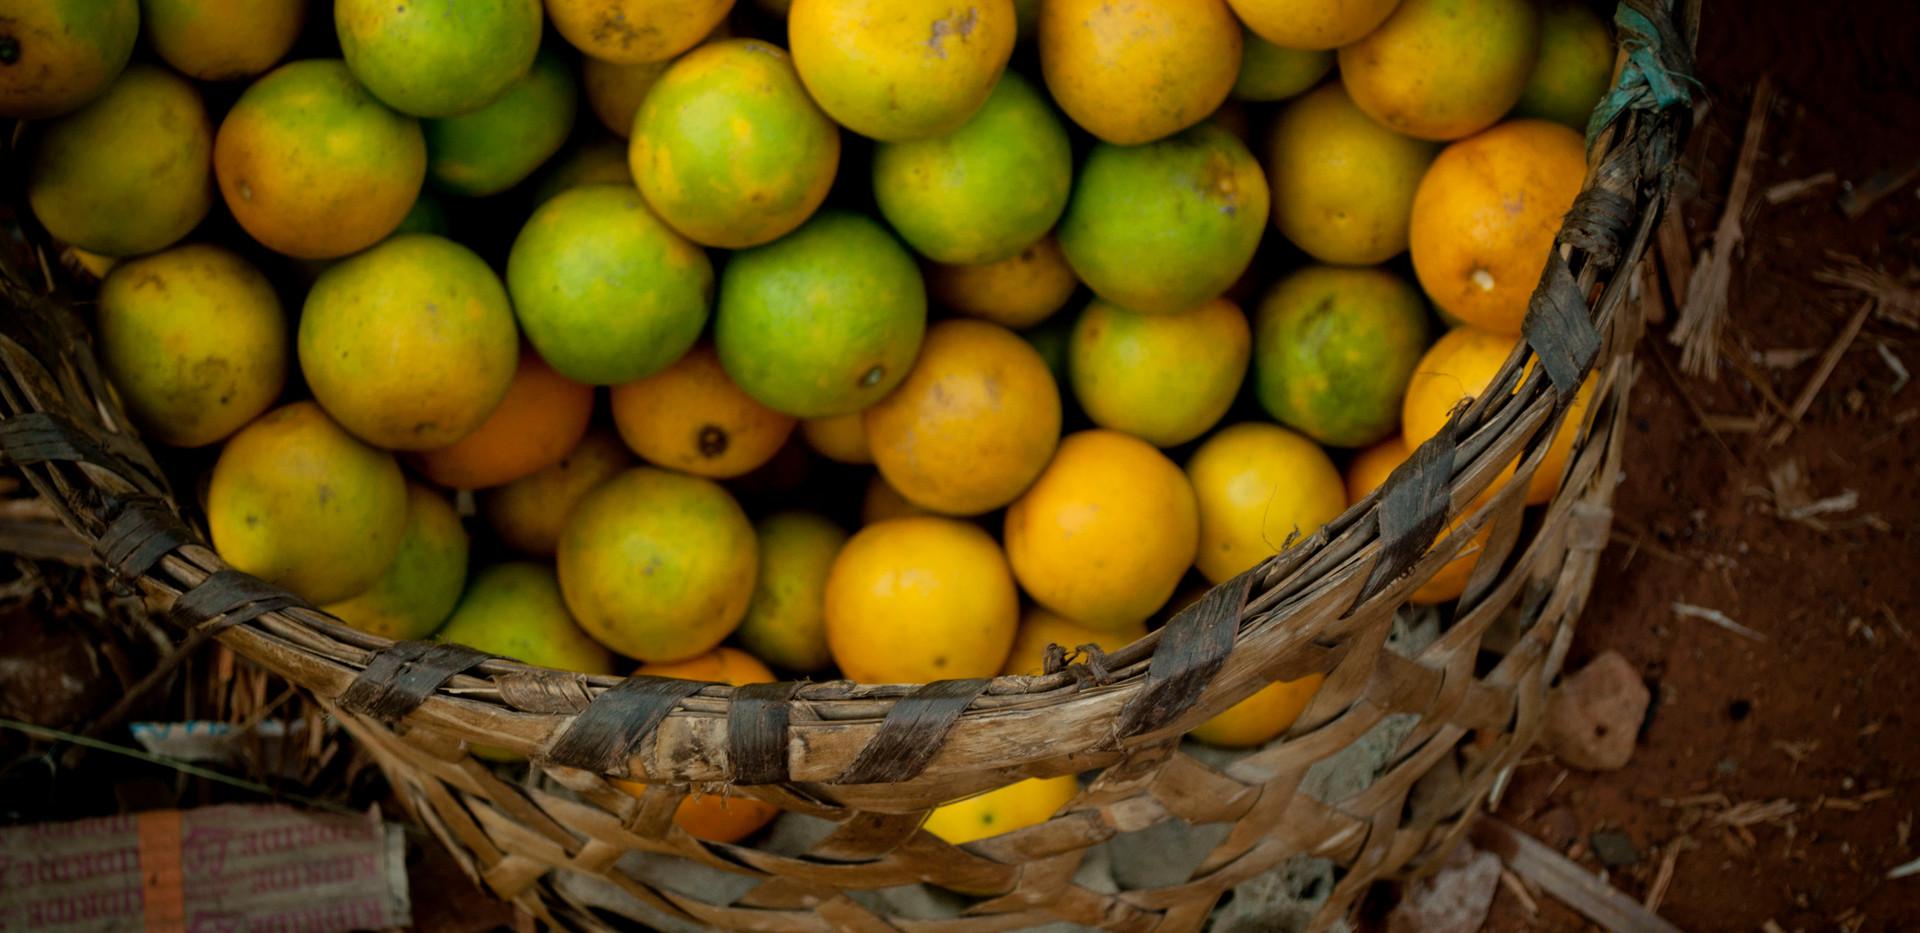 oranges are green